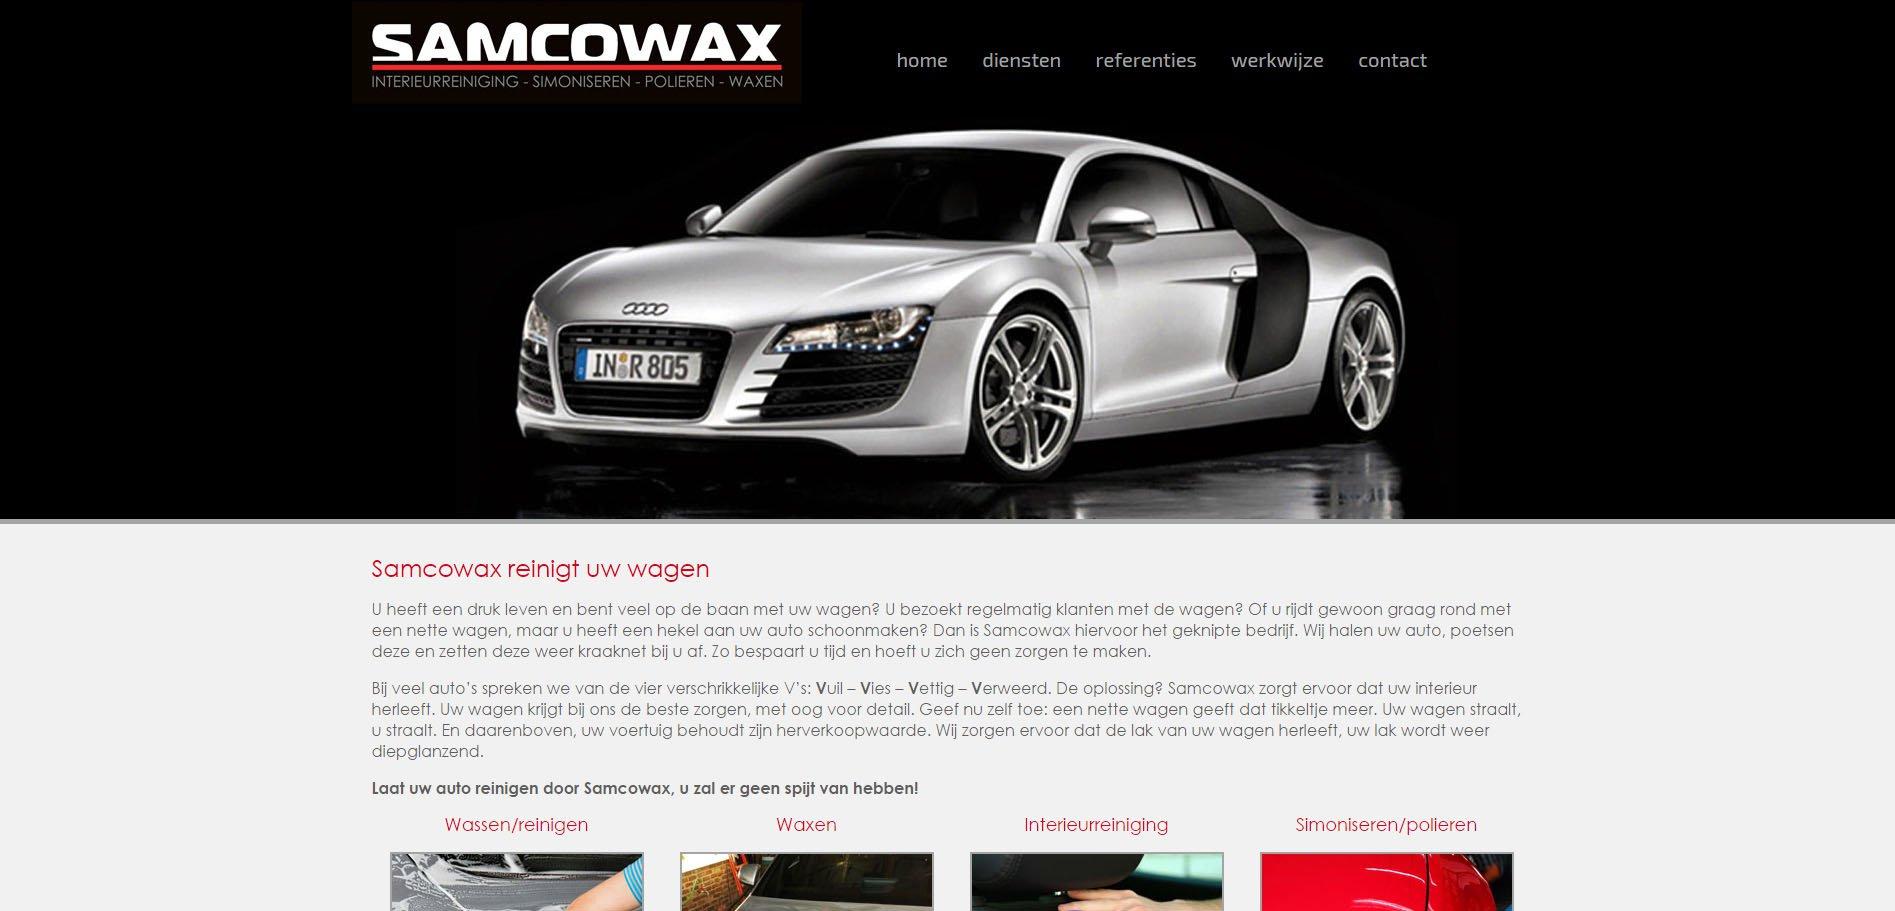 Samcowax